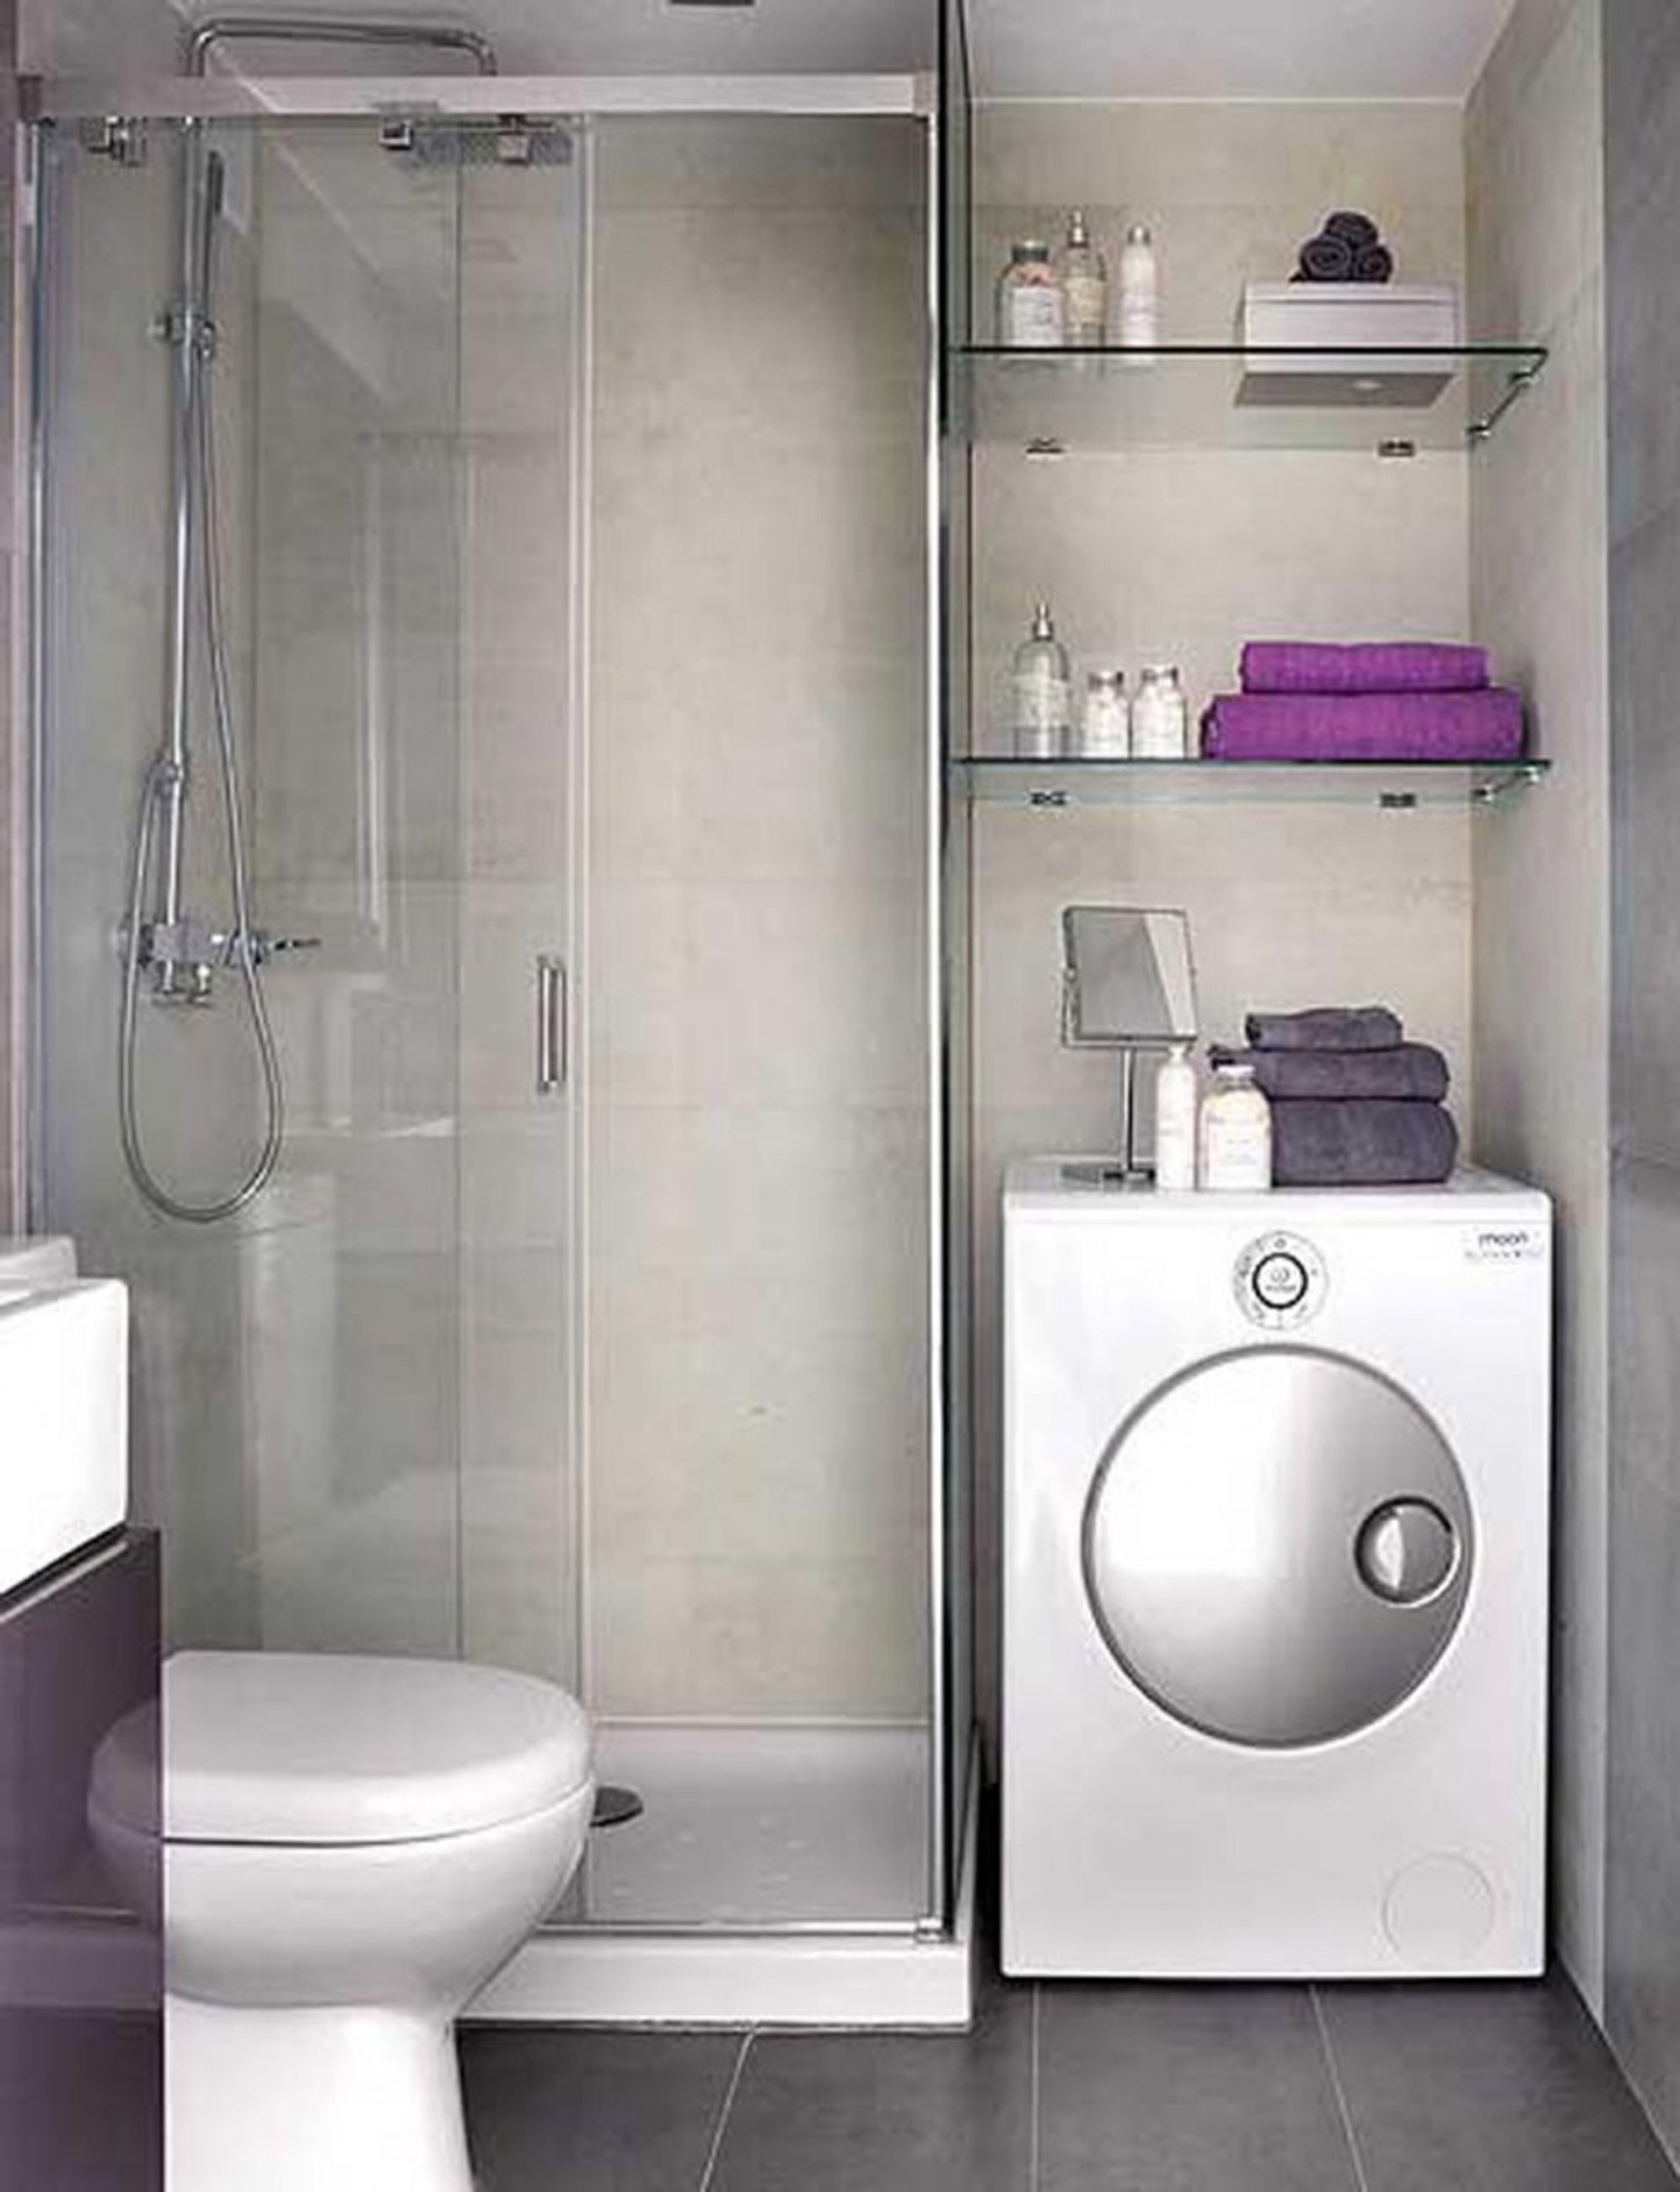 Simple Bathroom Attractive Grey Ikea Simple Bathroom Idea With Fantastic Simple Purple Touch Astoundin Laundry Room Bathroom Tiny House Bathroom Small Bathroom